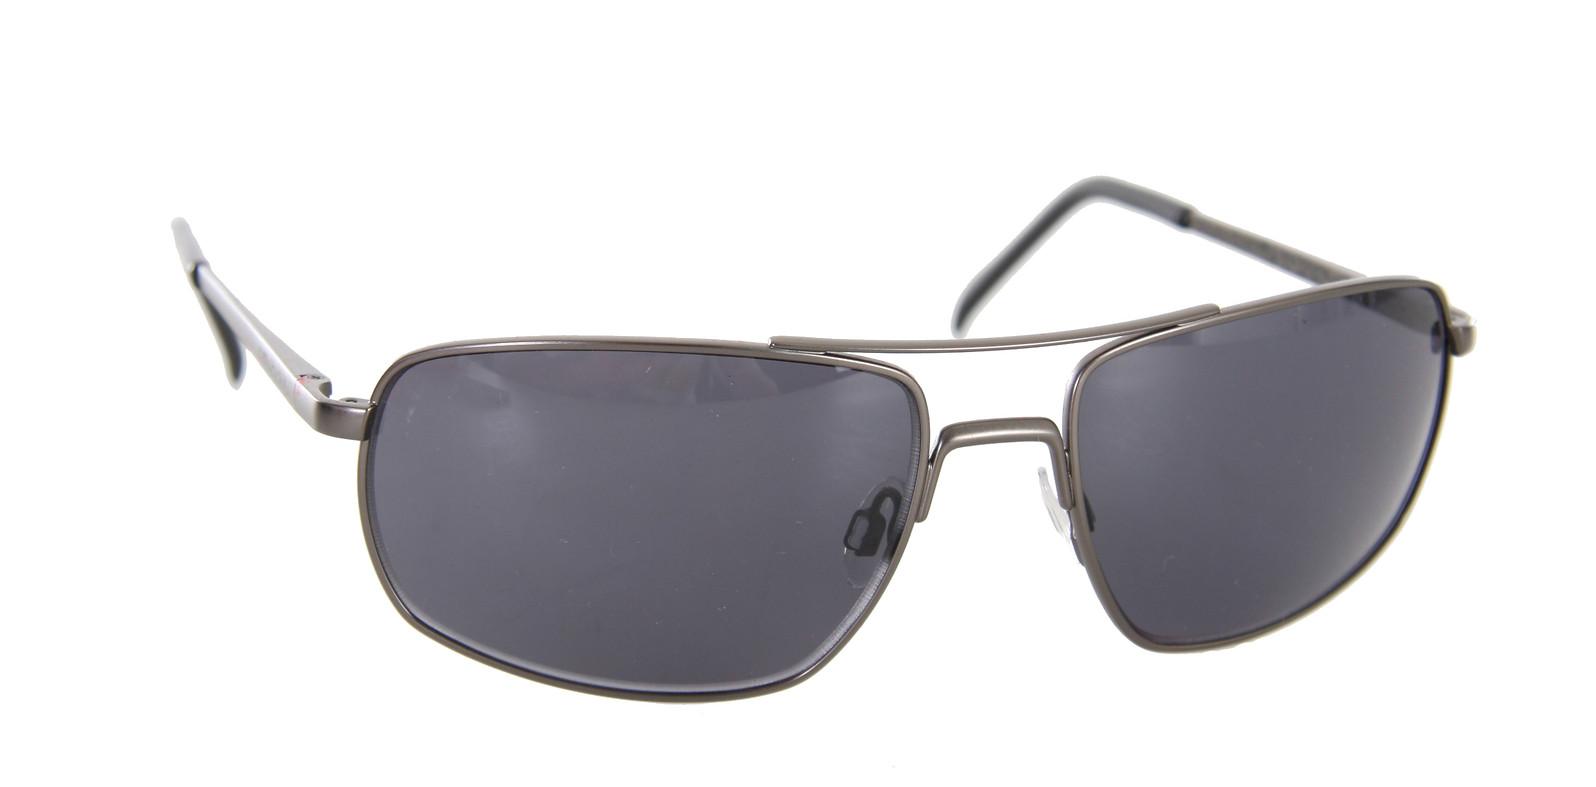 Dragon Fastback Sunglasses Steel/Grey Lens  dragon-fastback-sngls-steelgry-09.jpg